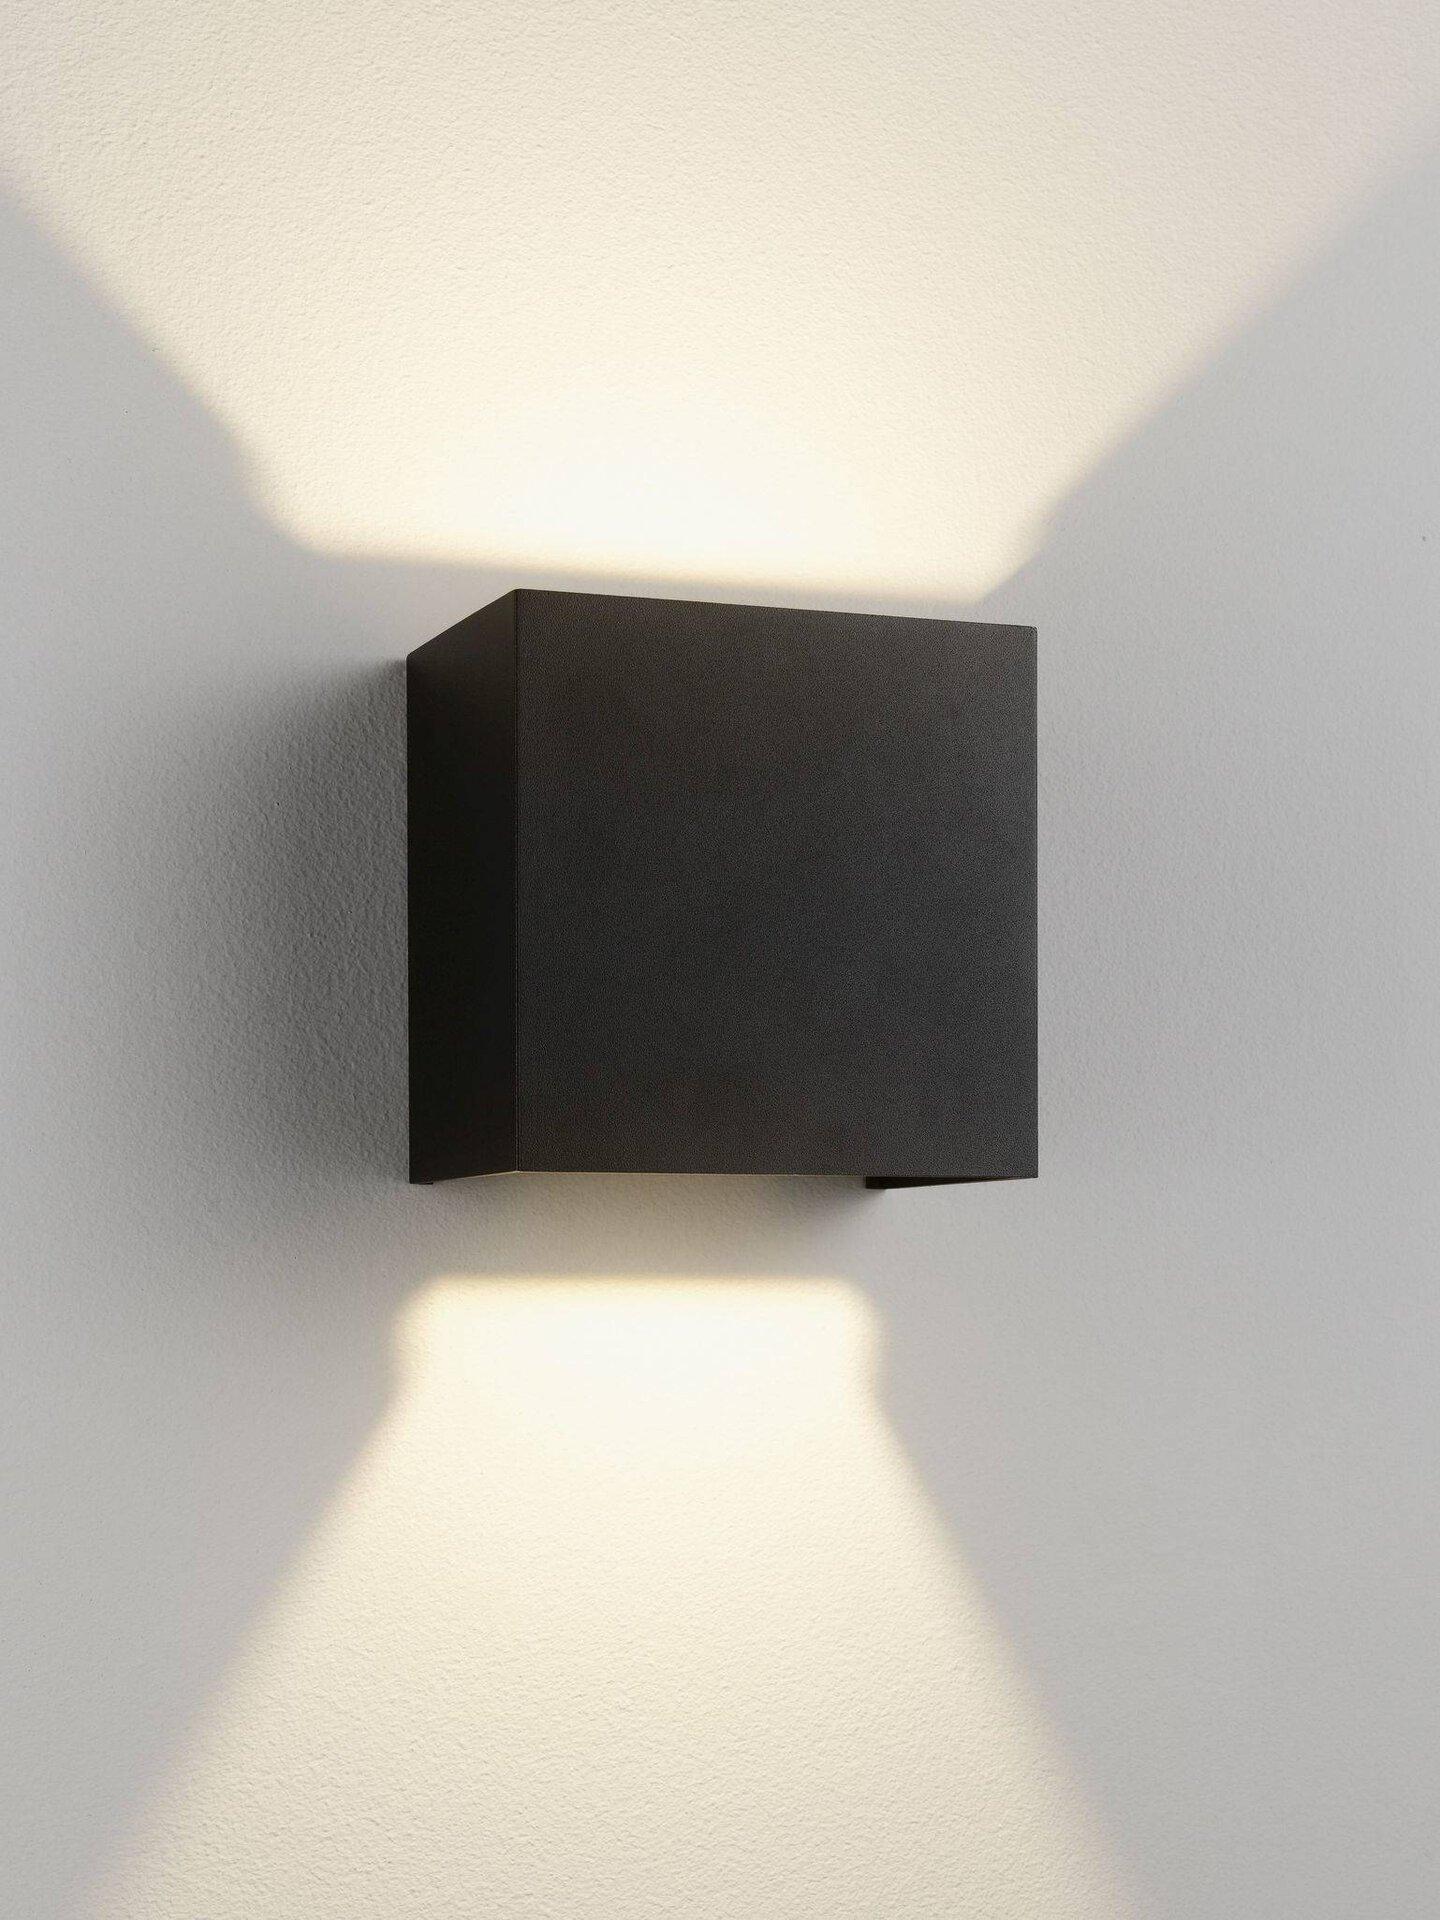 Wand-Aussenleuchte CUBI II - Casa Nova - Shining Casa Nova Metall grau 15 x 15 x 10 cm